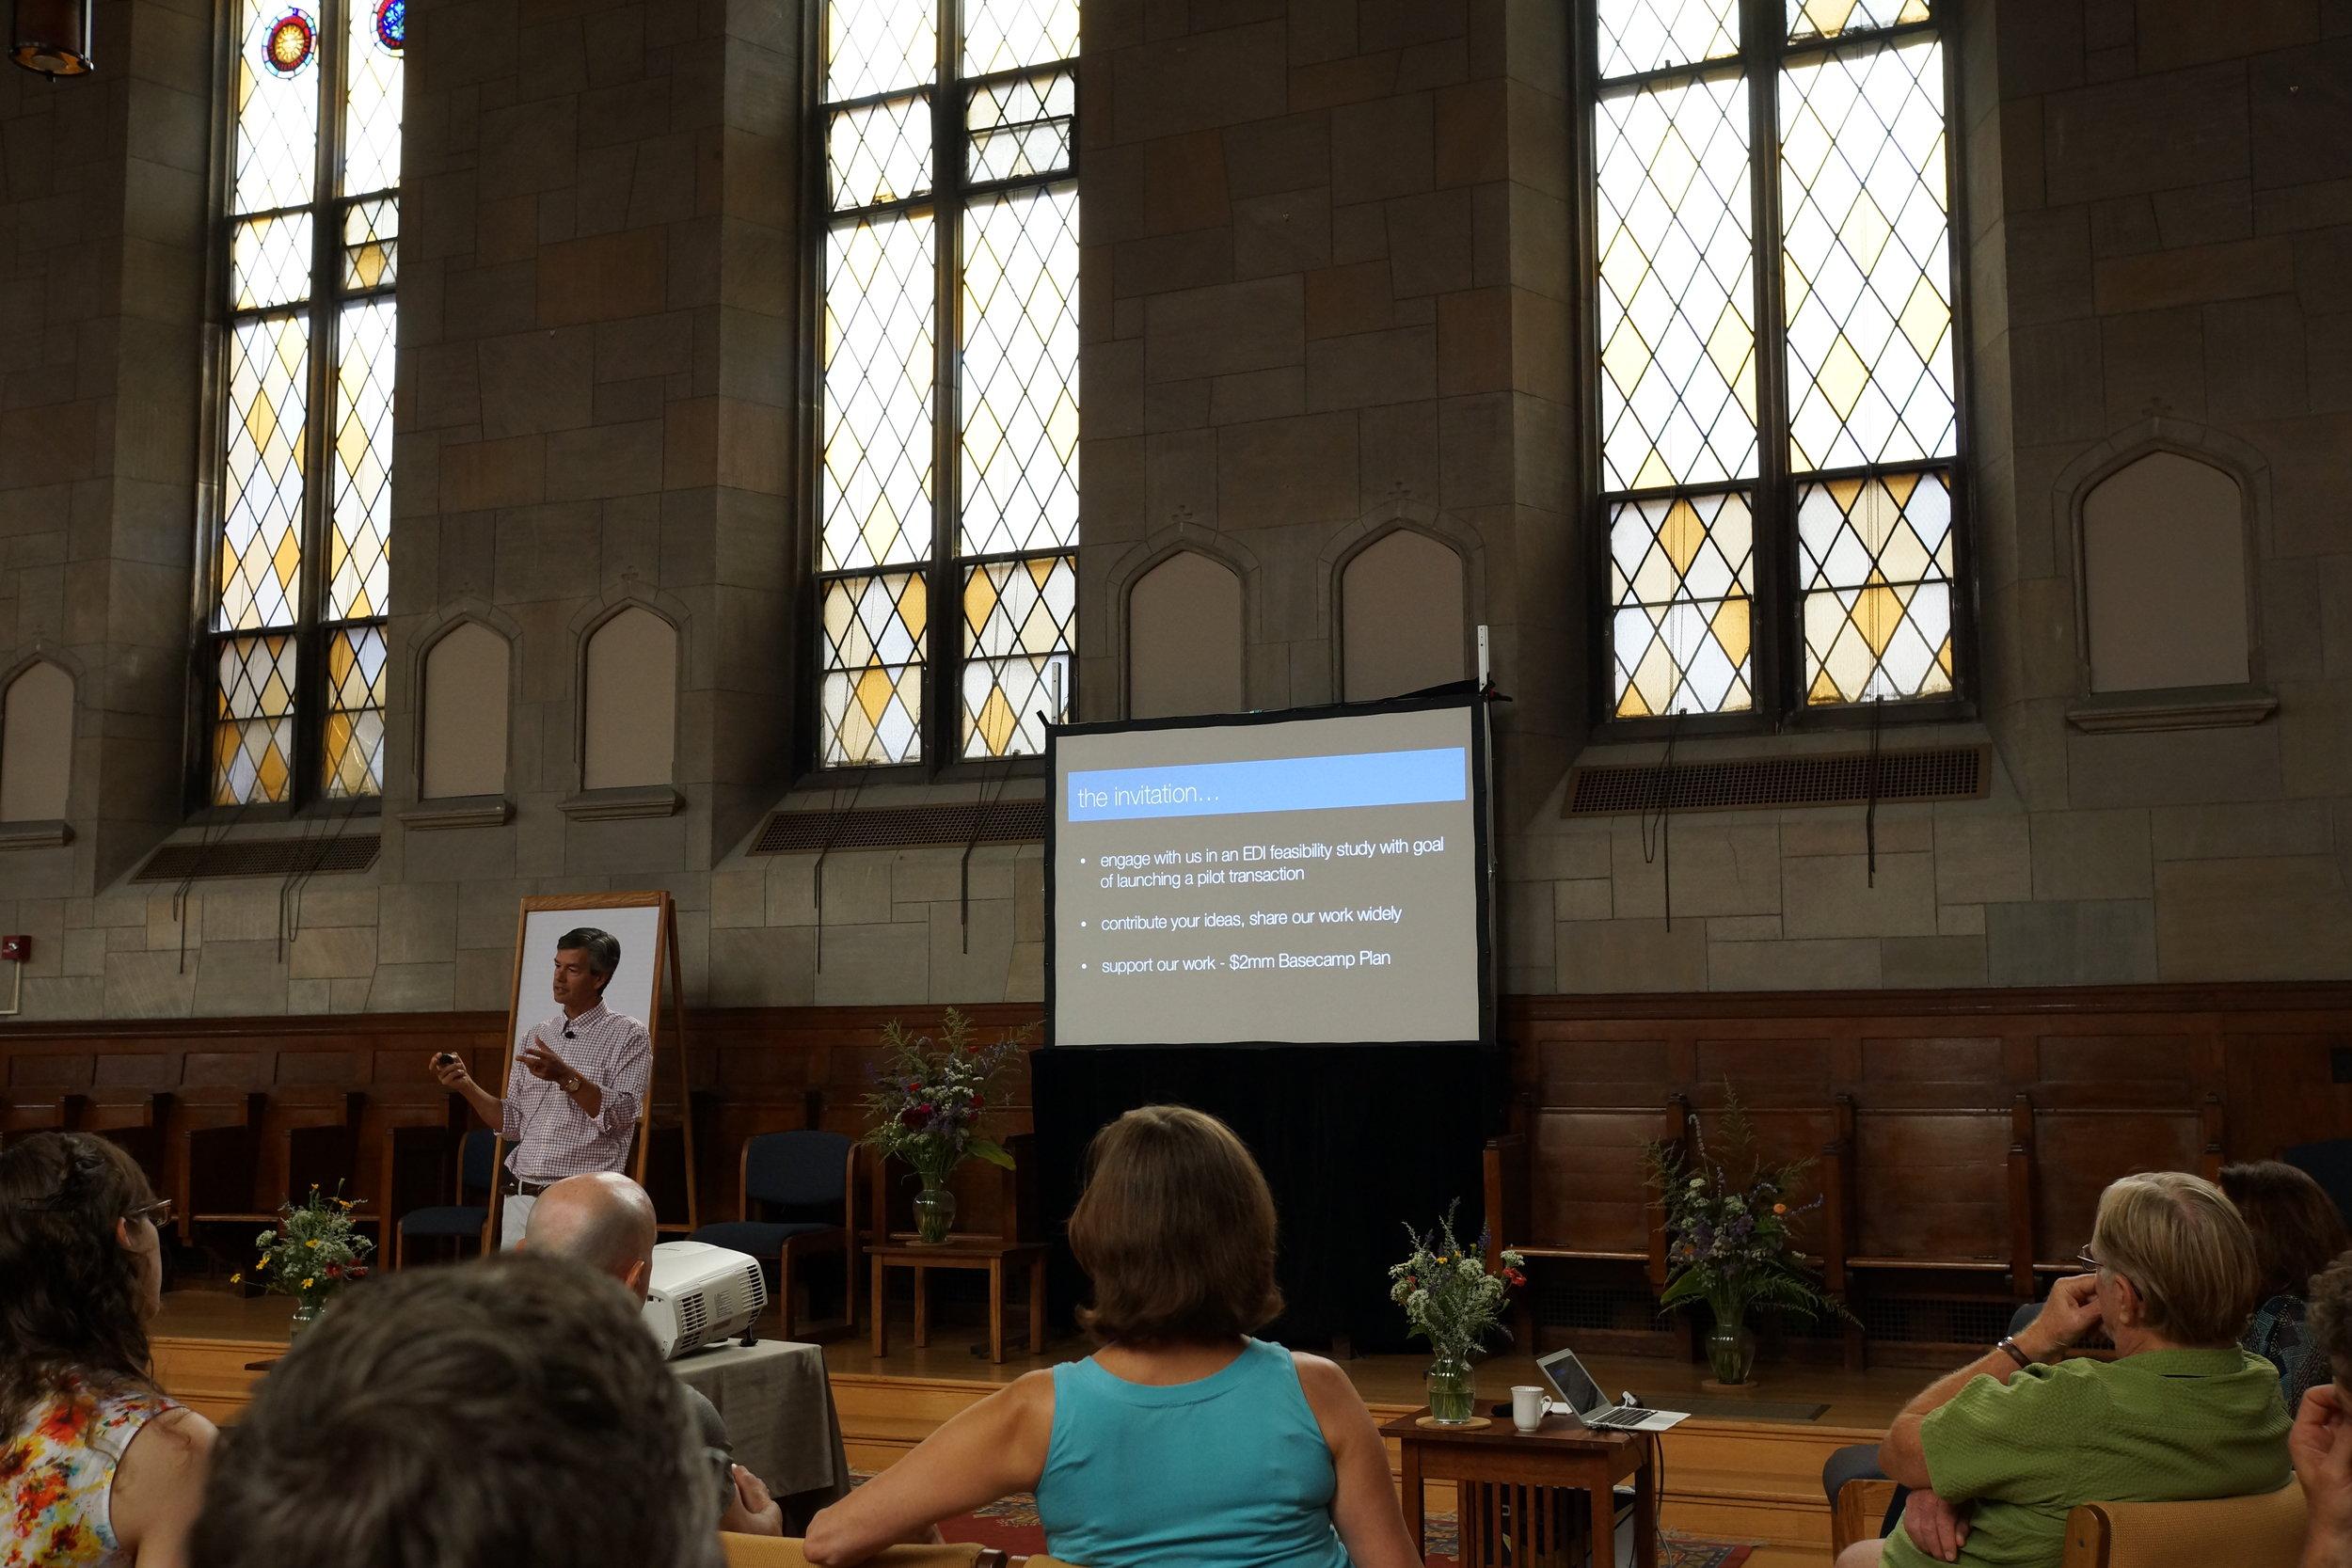 John Fullerton giving a presentation